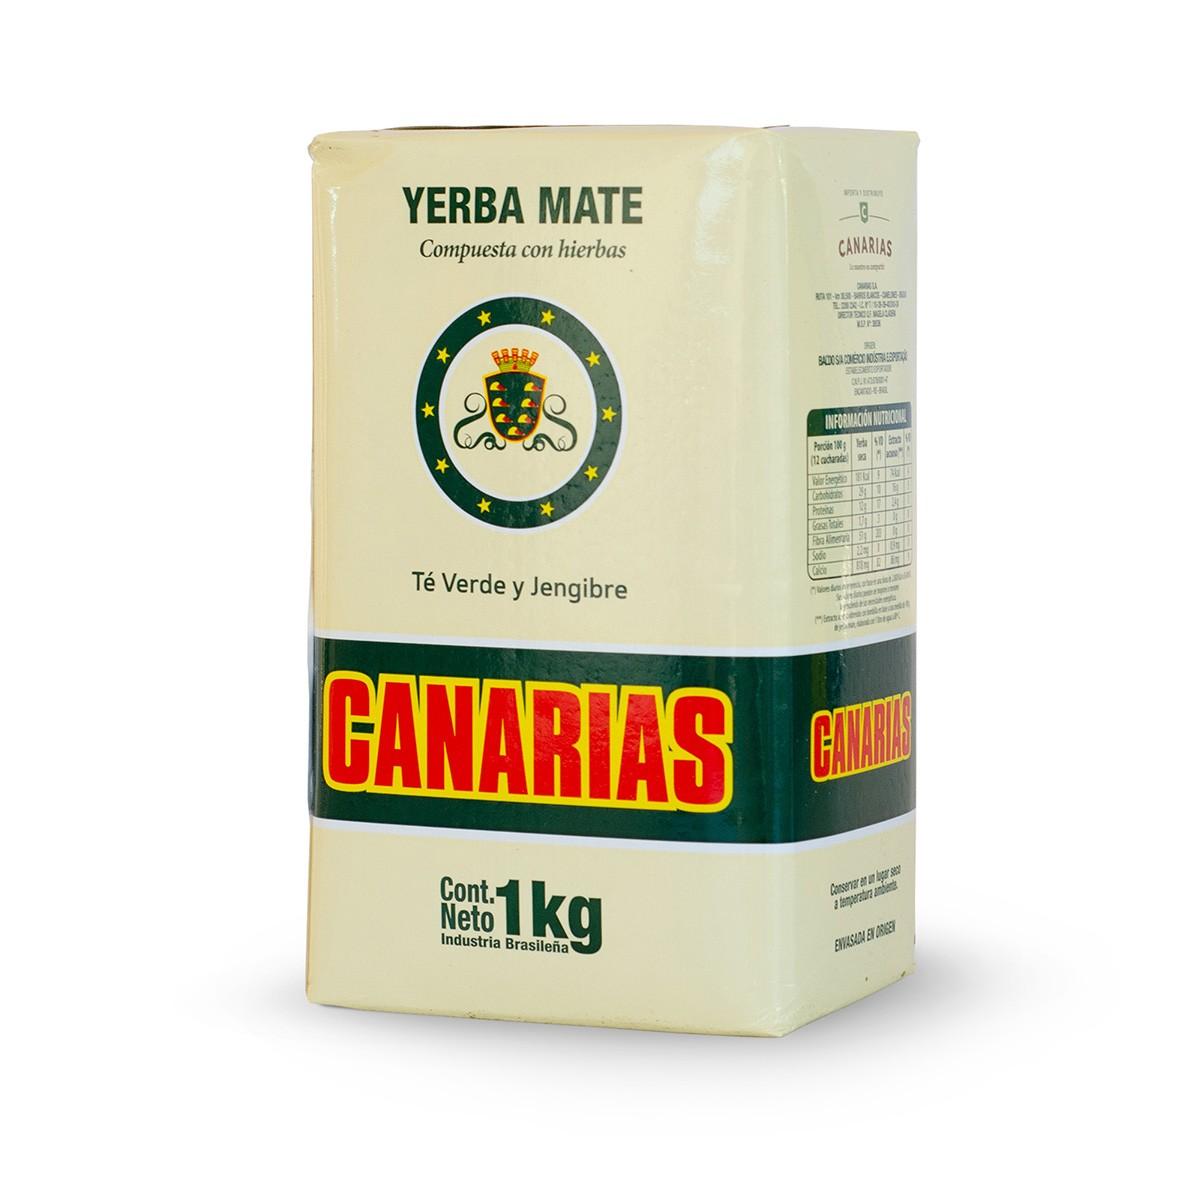 Erva Mate Yerba Mate Chimarrão Uruguaia Canarias Té Verde Y Jengibre 1 Kg